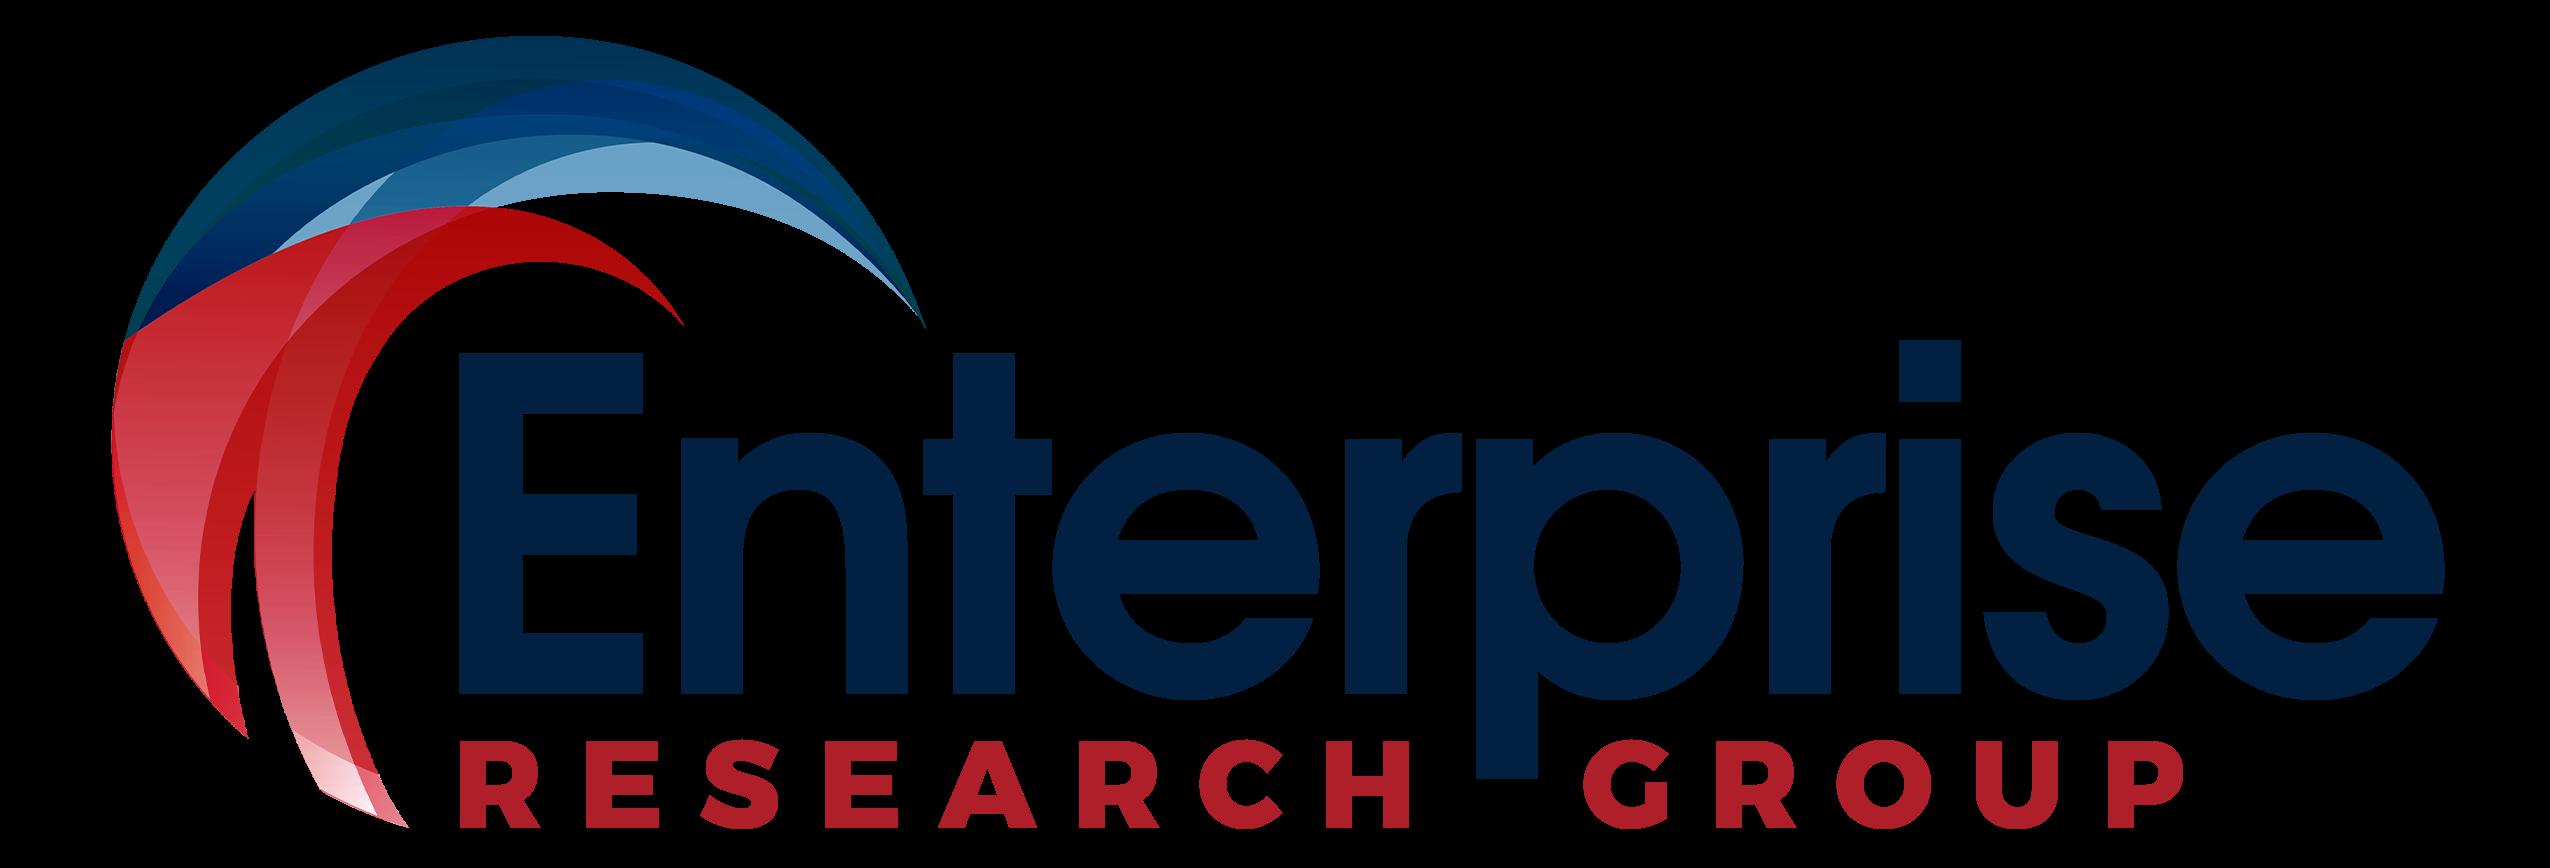 Enterprise Research Group